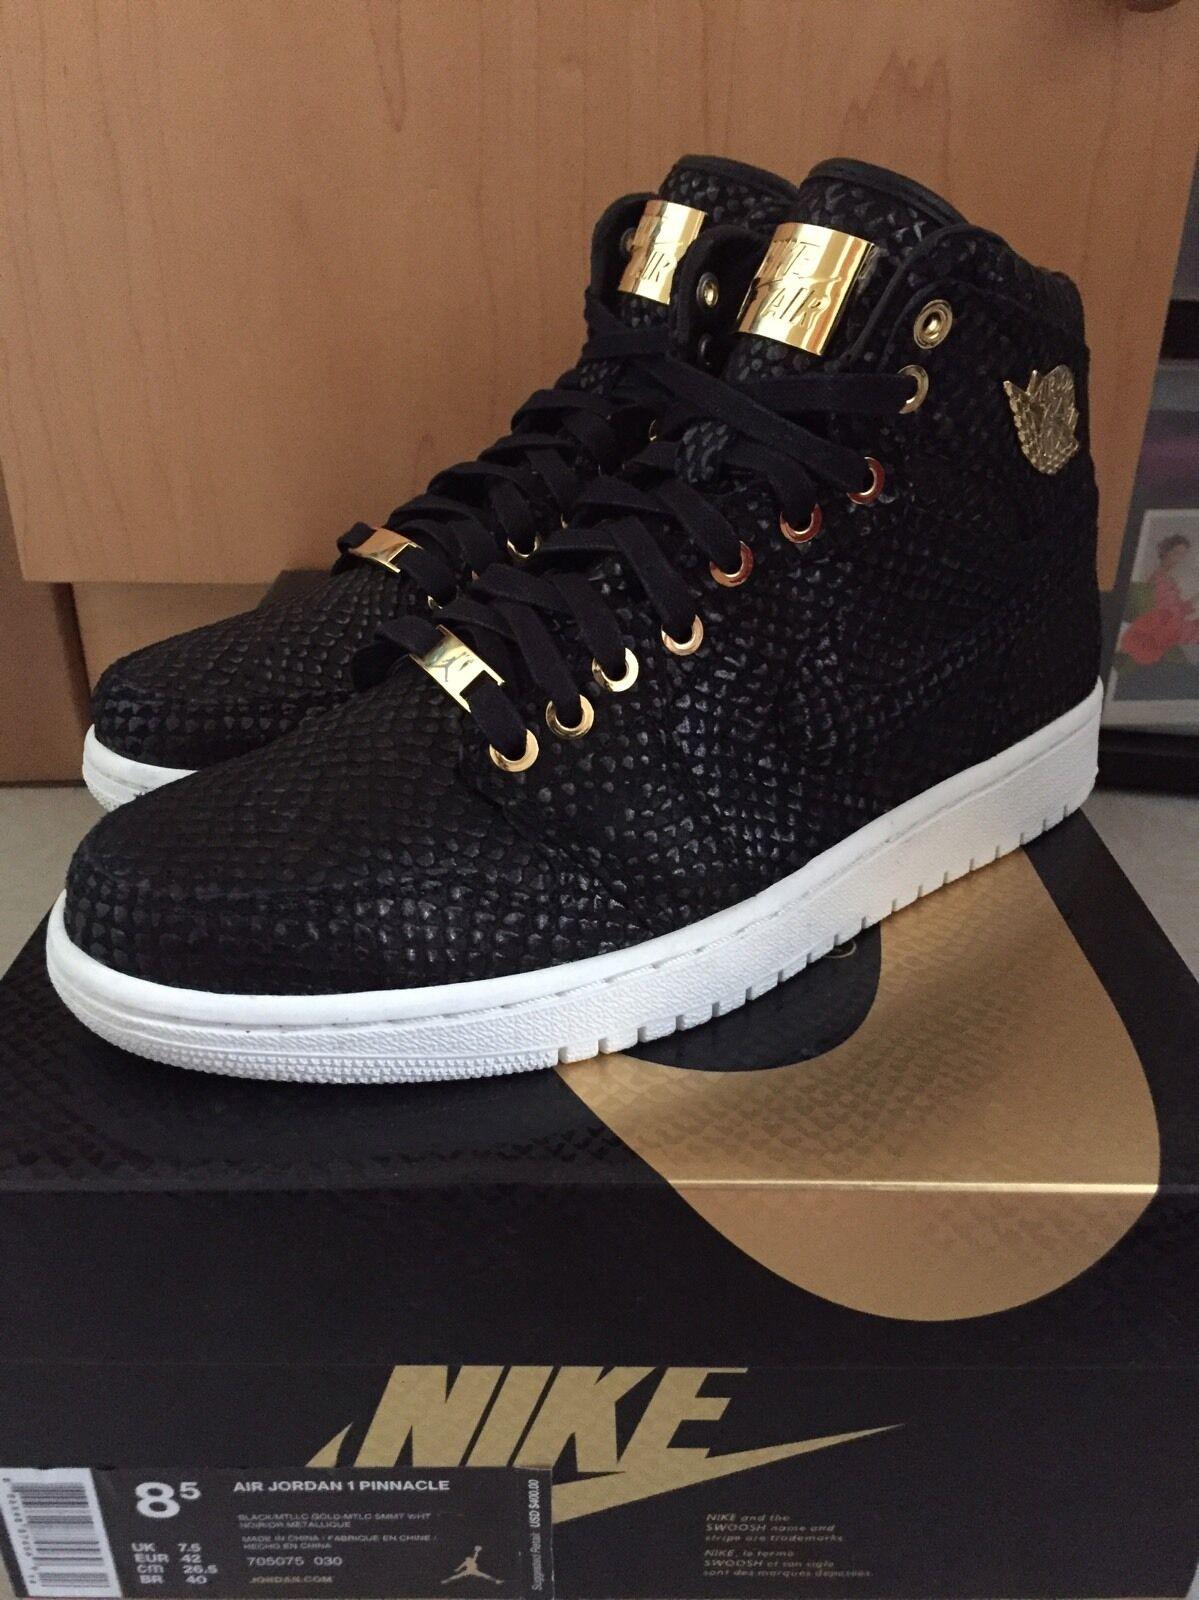 New Pinnacle Black Jordan 1 Retro Size 8.5 24 K gold 705070-030 Nike Bred Top 3